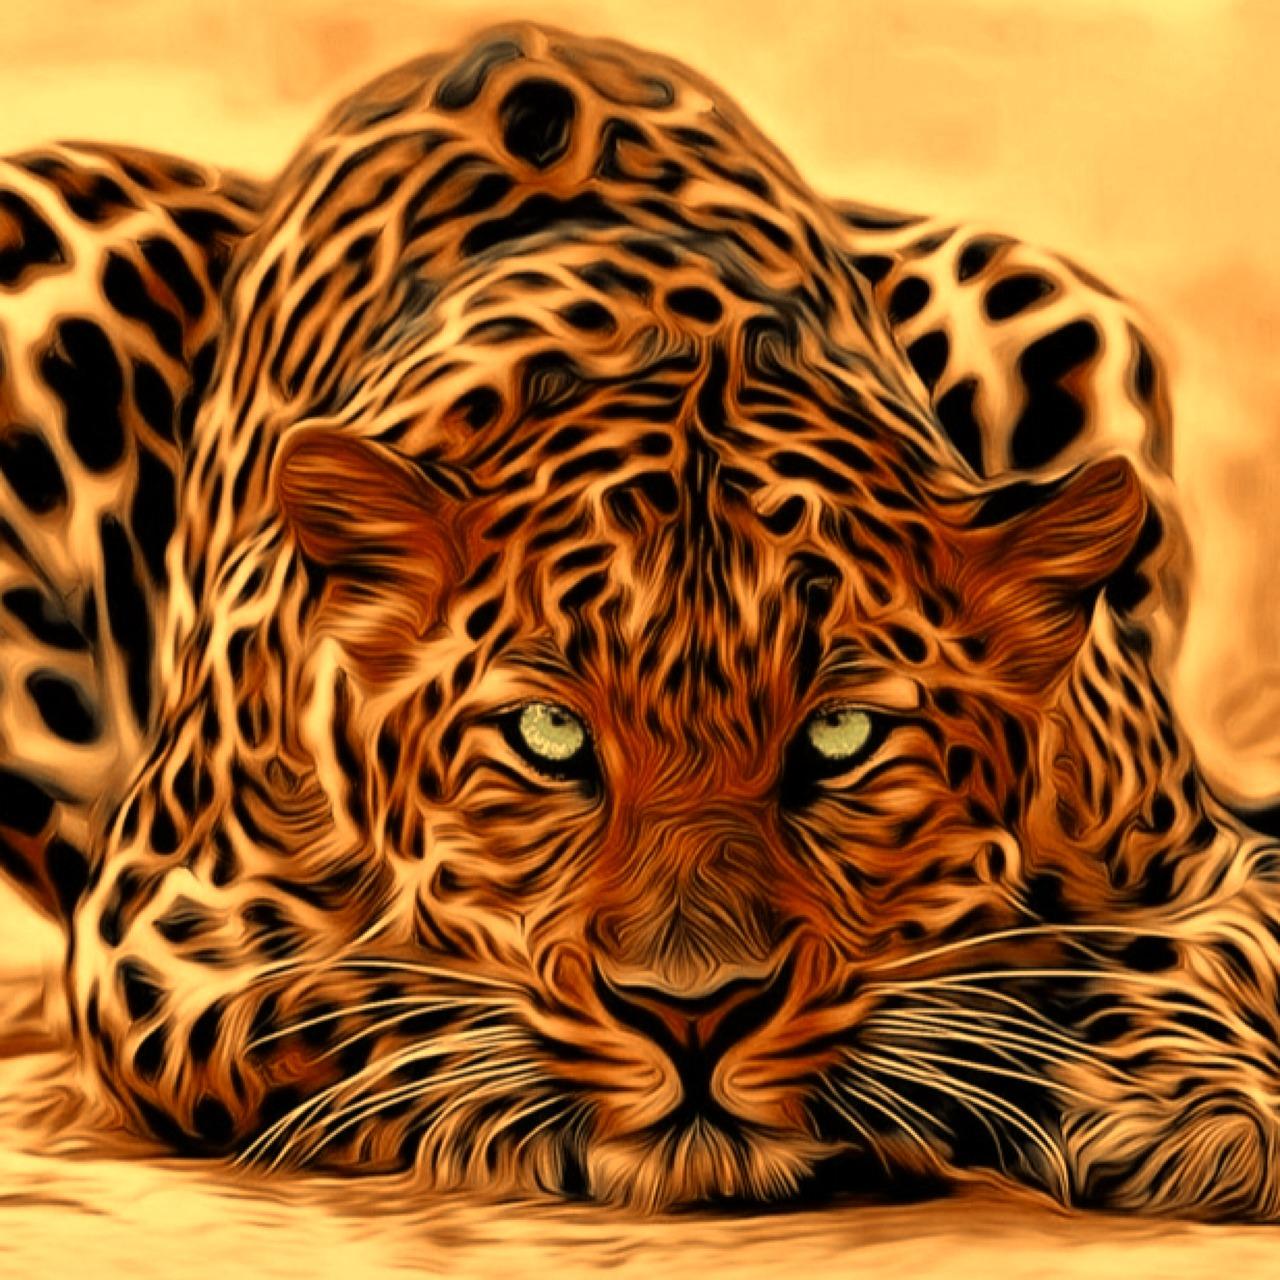 Блестящая картинка тигра 7